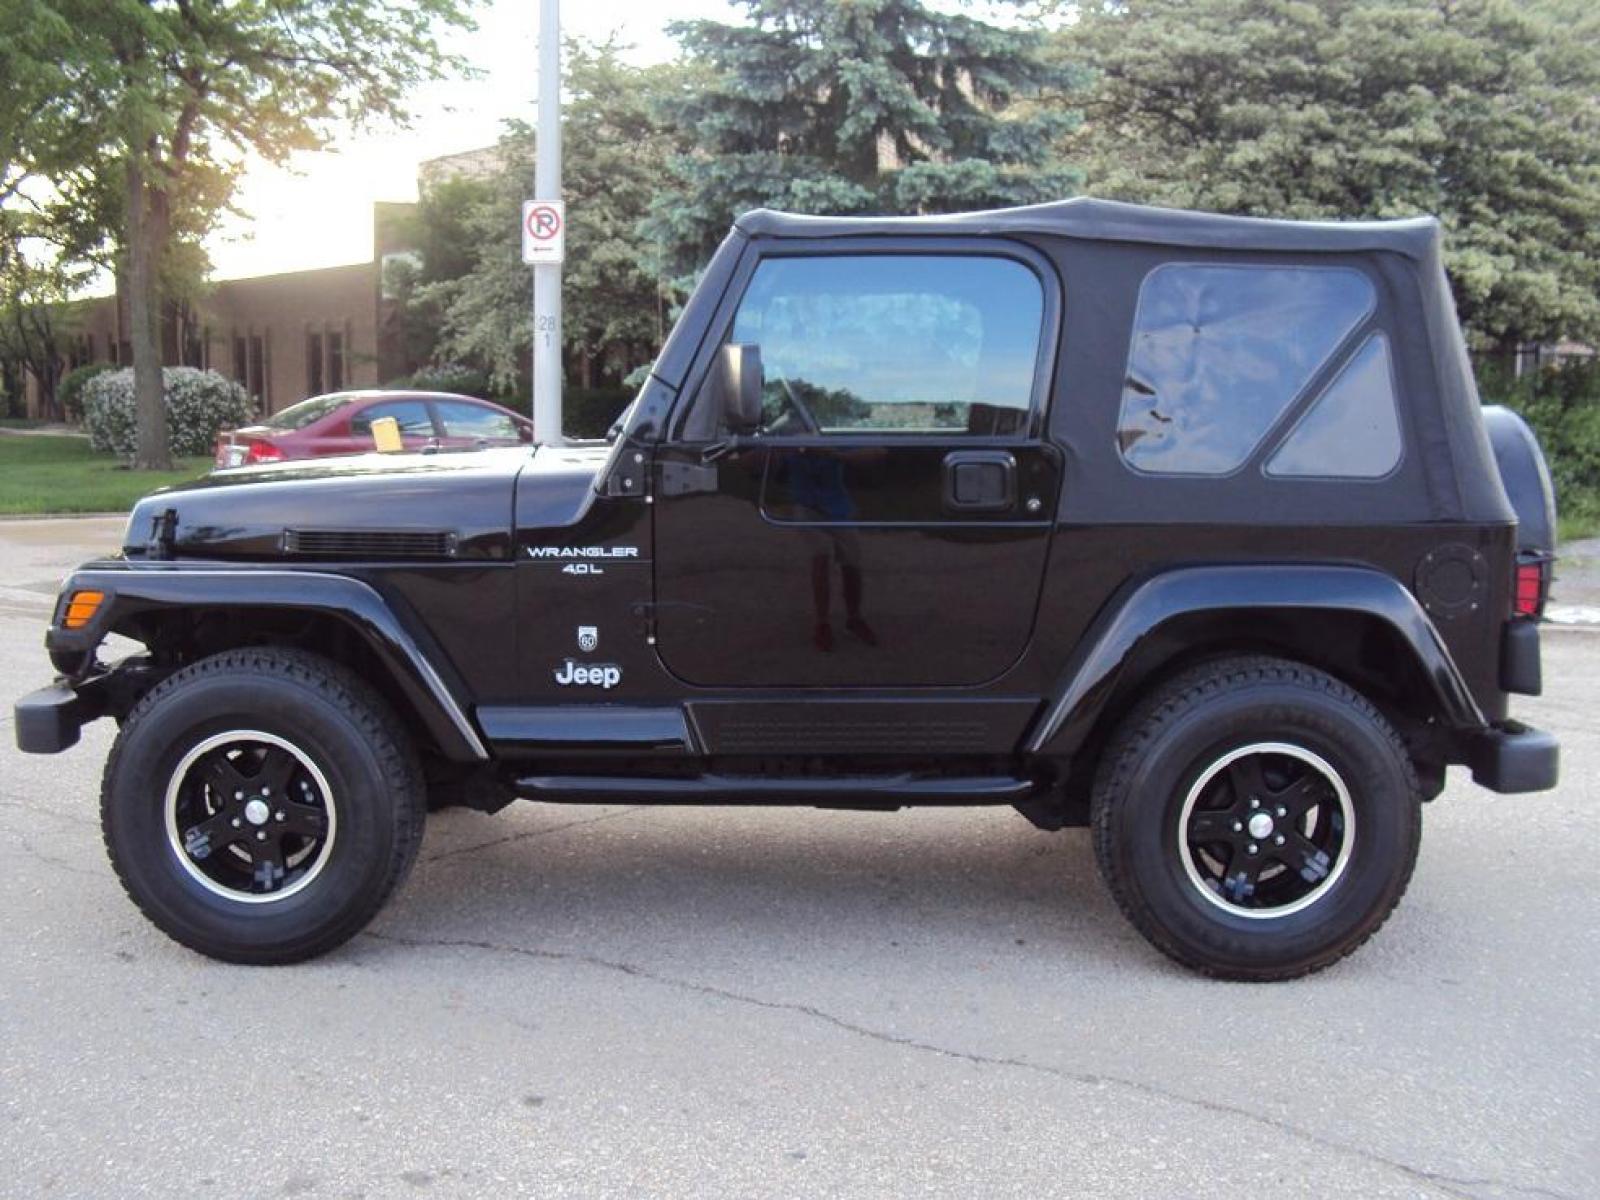 800 1024 1280 1600 origin 2001 jeep wrangler